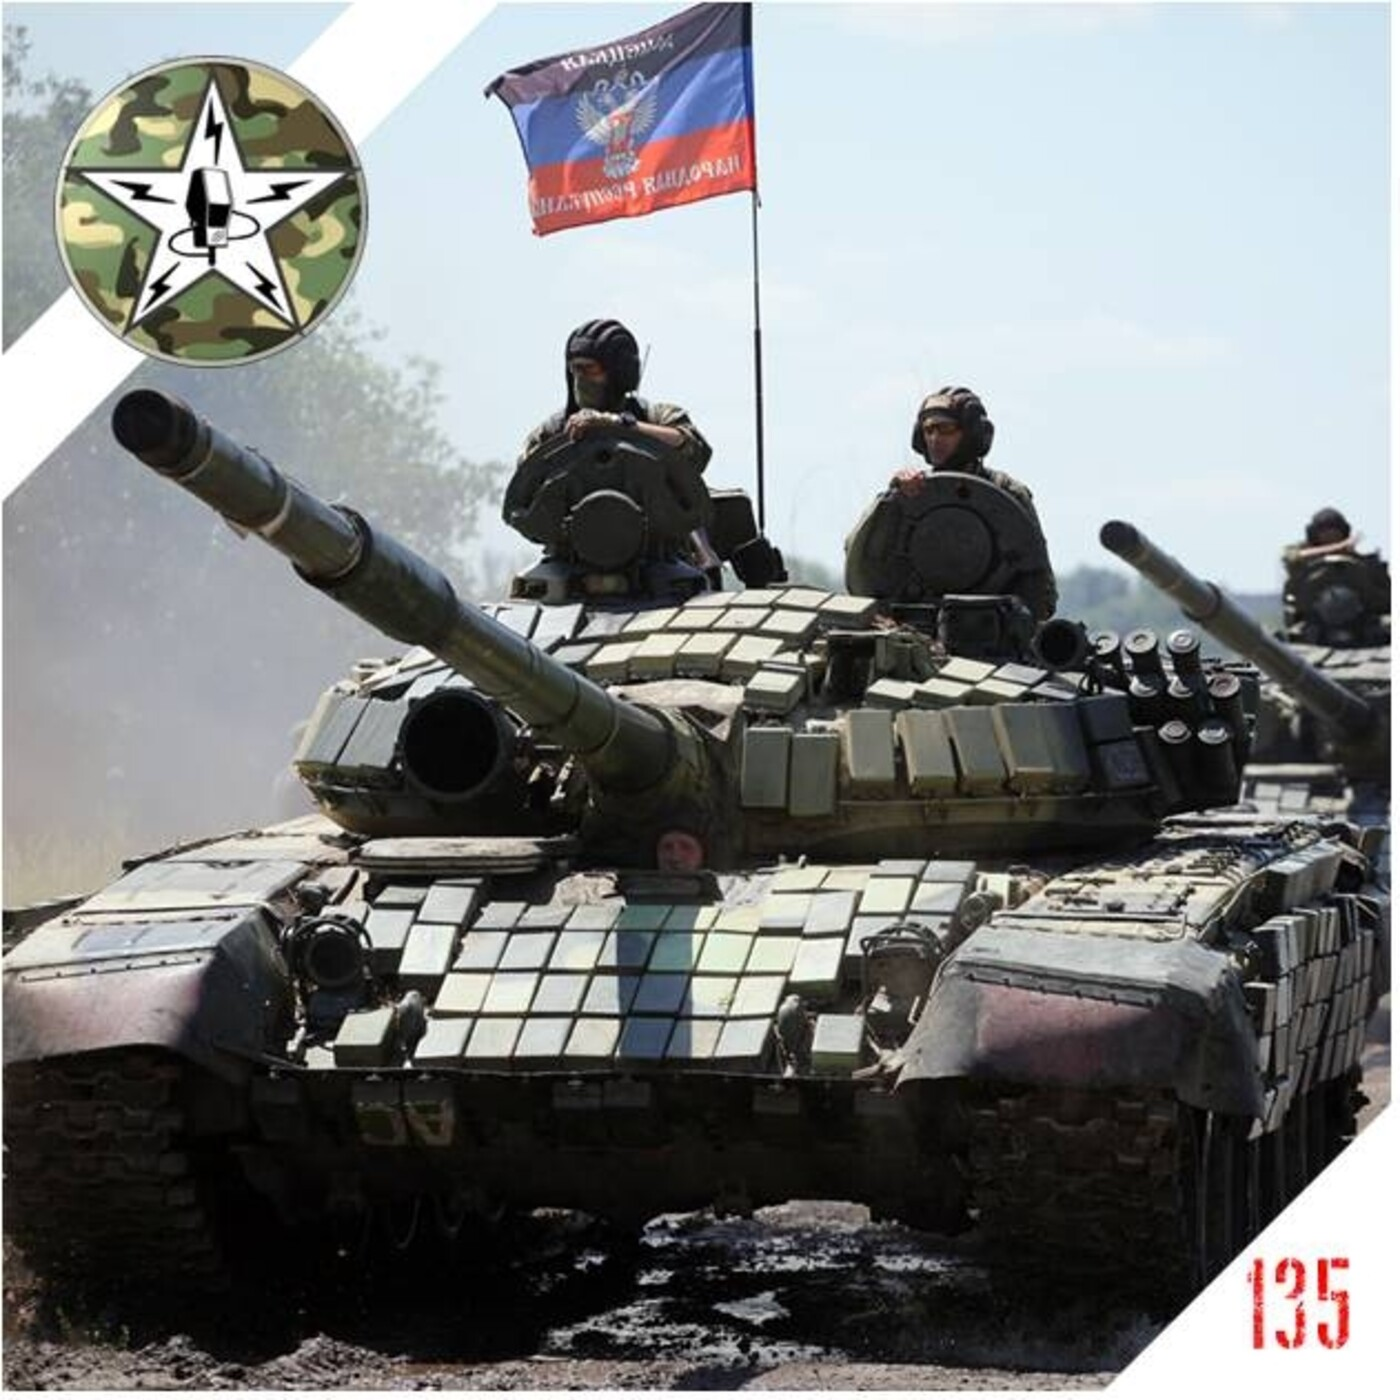 CBP#135 Crisis del Donbáss 2. Fuerzas enfrentadas 2014 - Ucrania Rusia Guerra Maidan